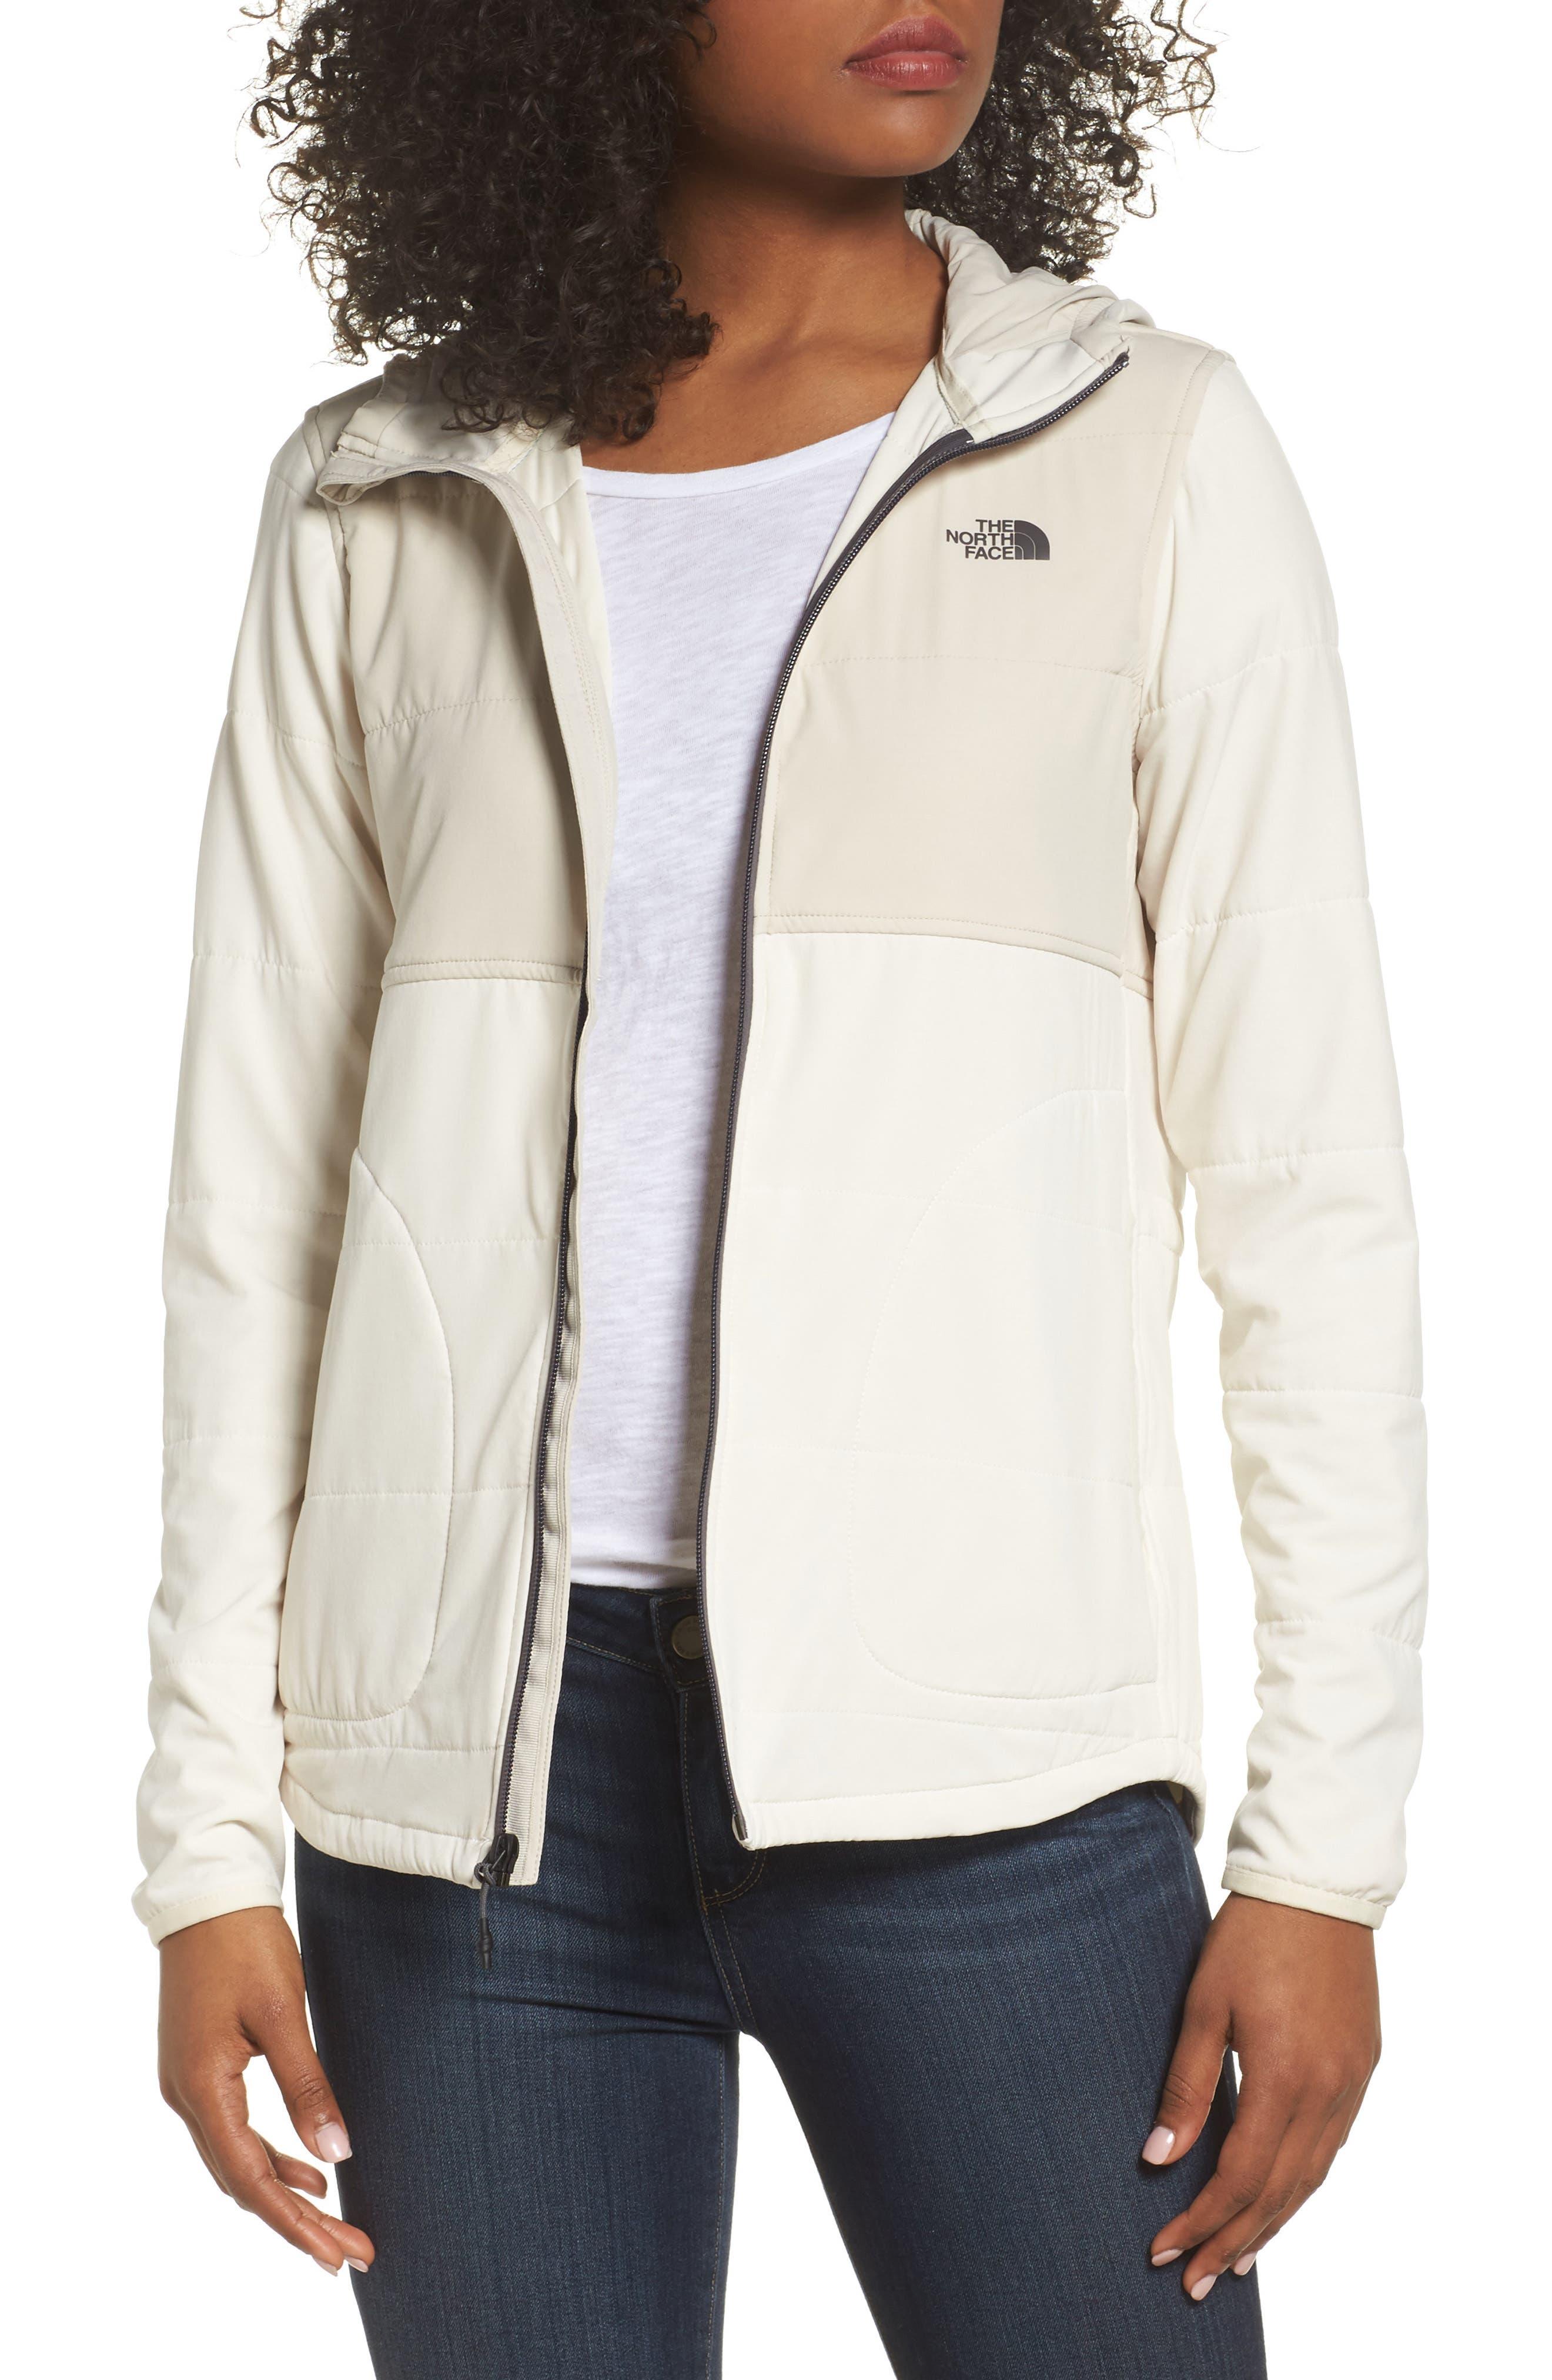 Mountain Sweatshirt Insulated Hooded Jacket,                         Main,                         color, 100